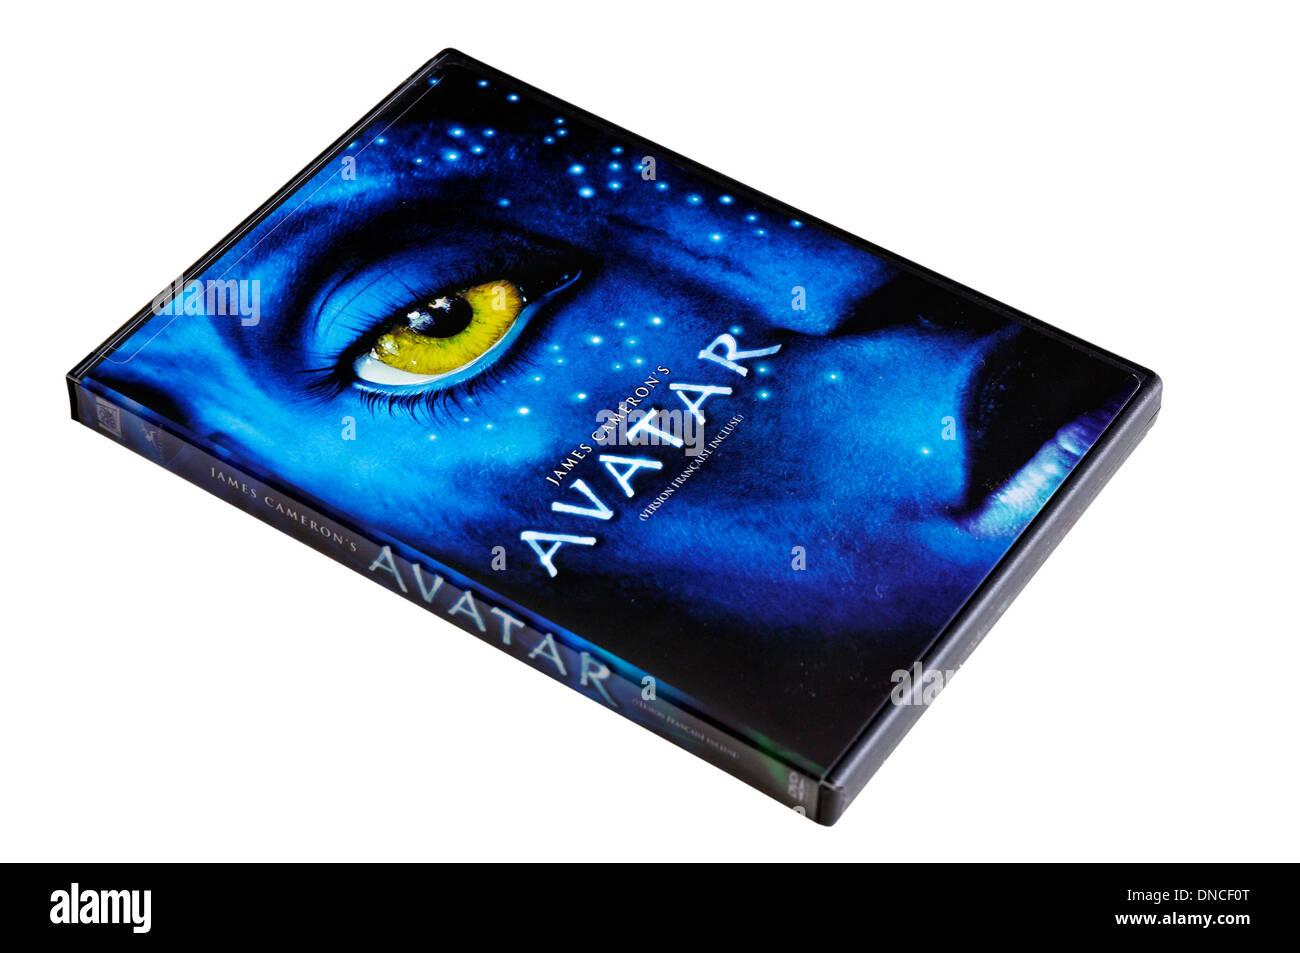 Avatar DVD Immagini Stock